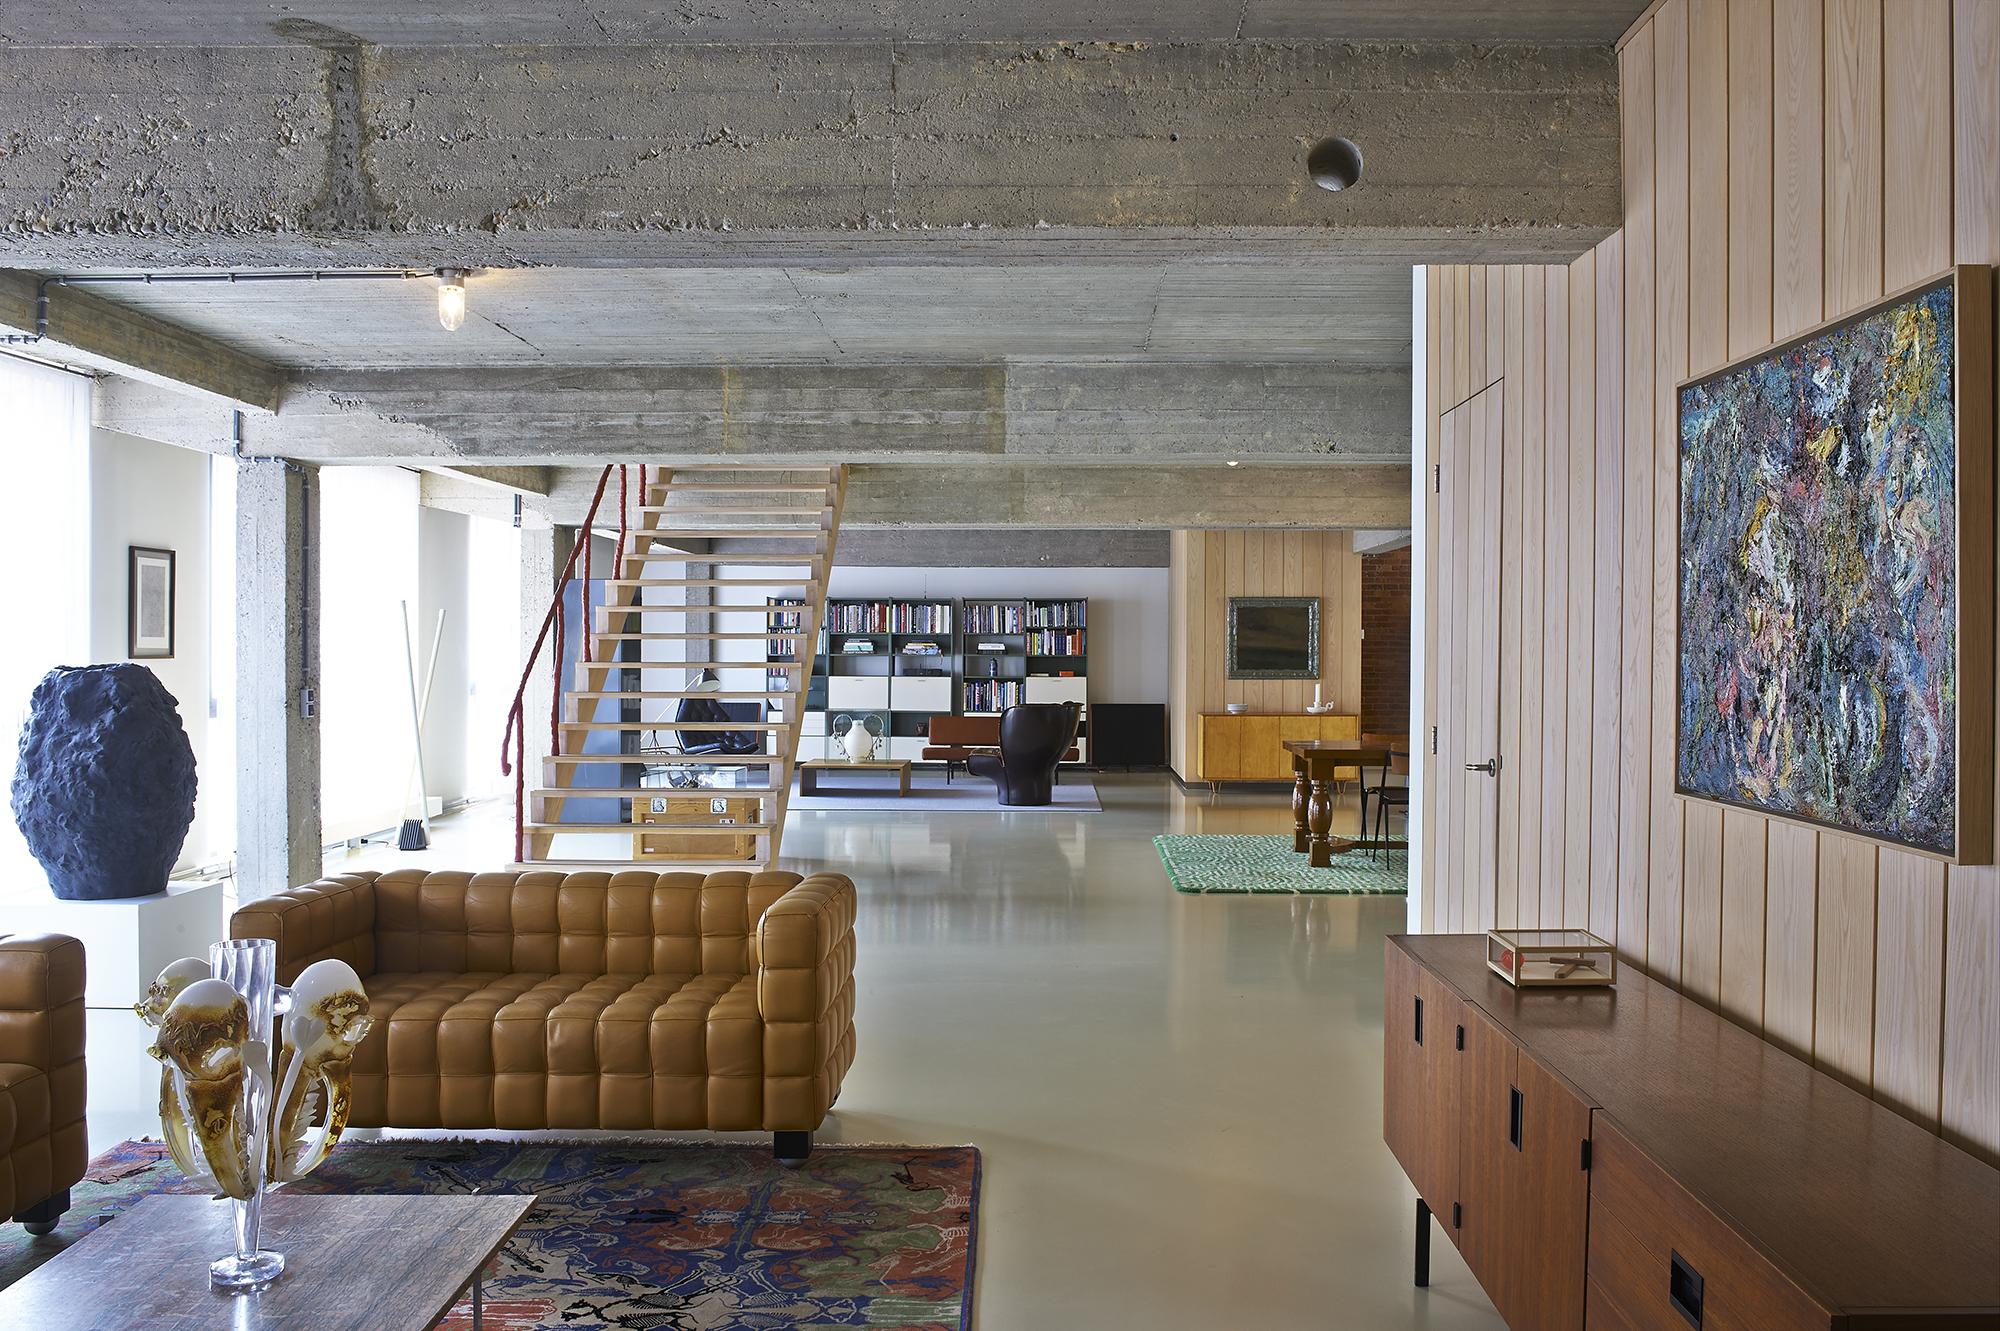 HH-Loft 1st floor living ph Dennis Brandsma 22713 0060